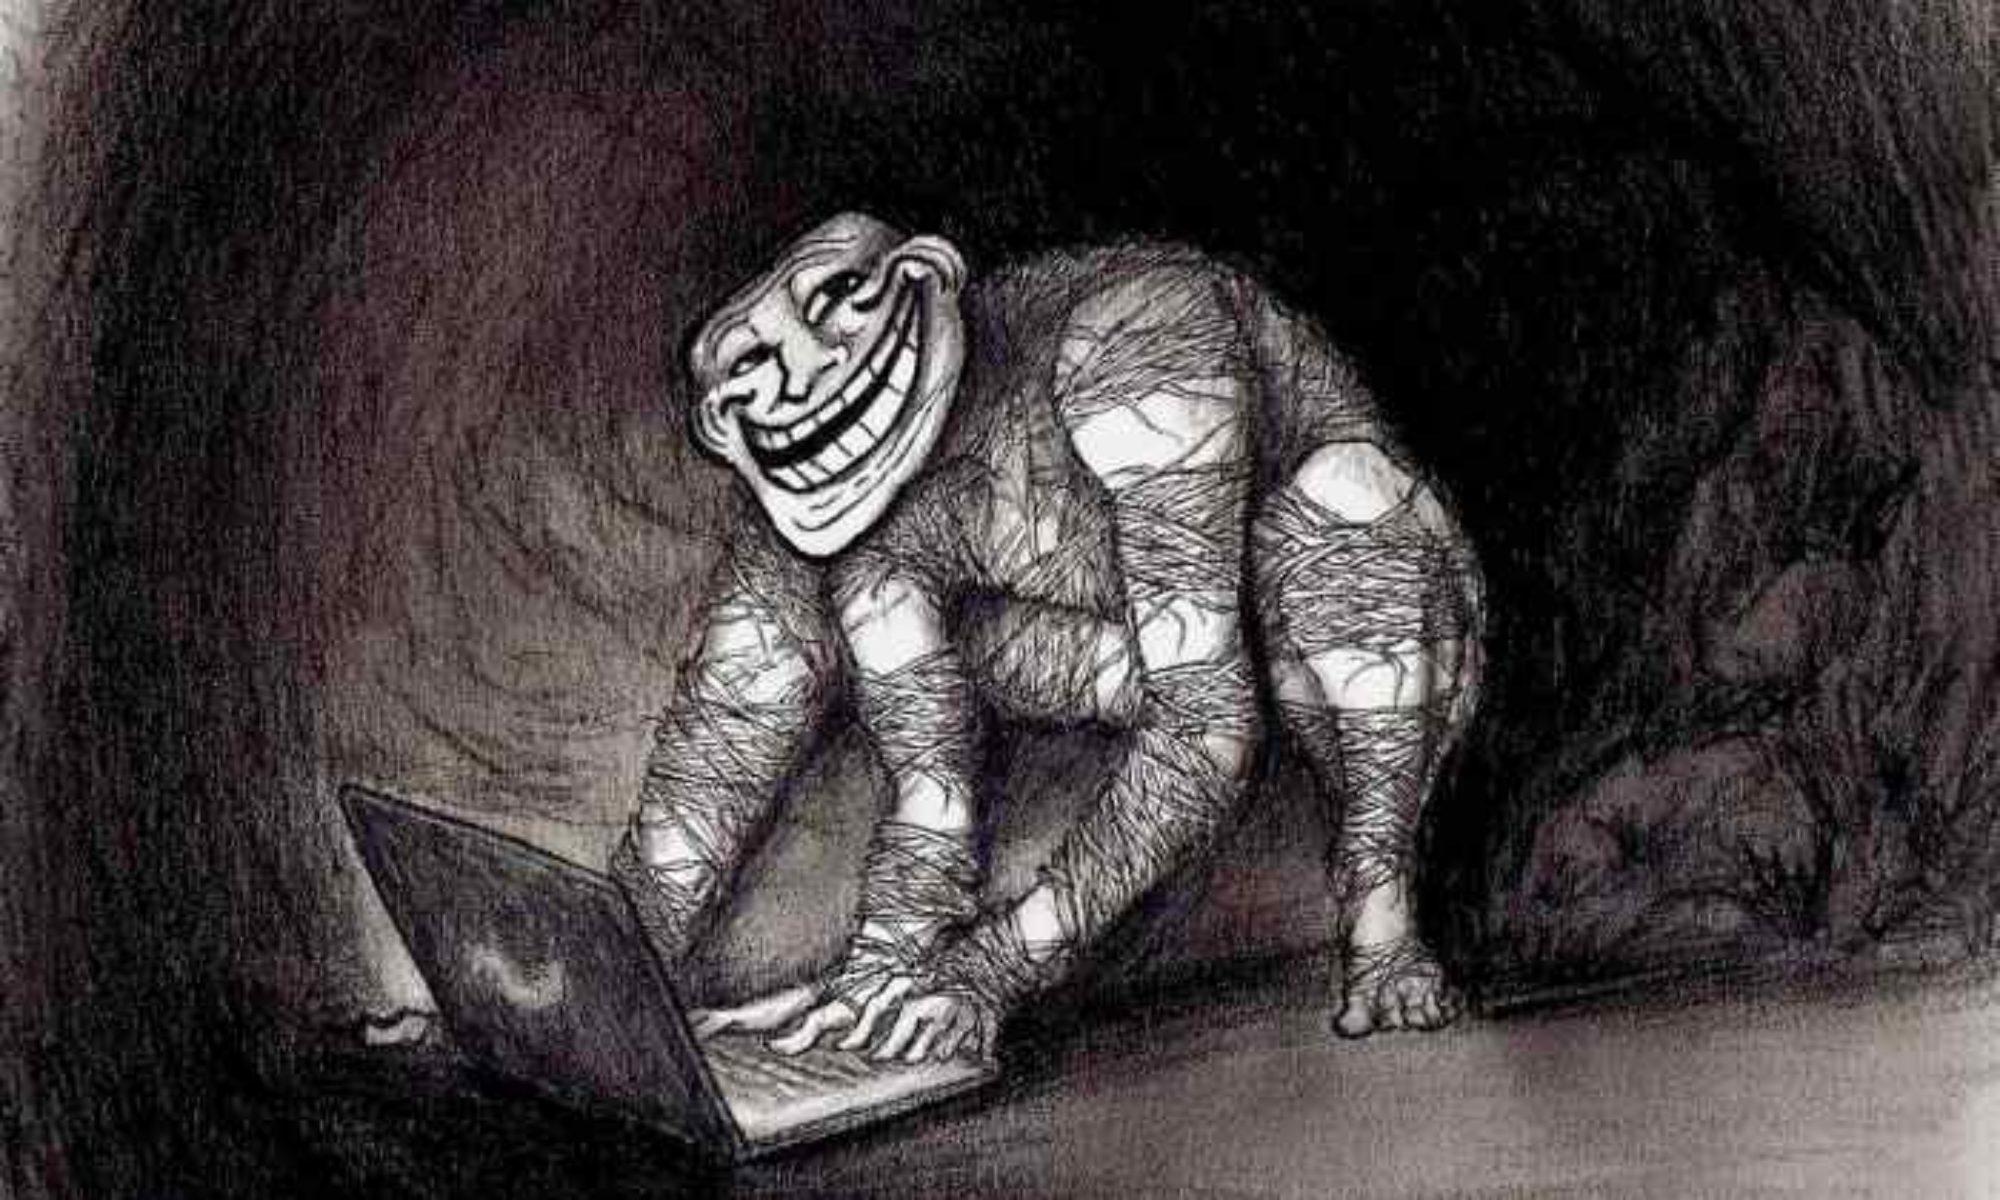 Le mooc sur le trolling art